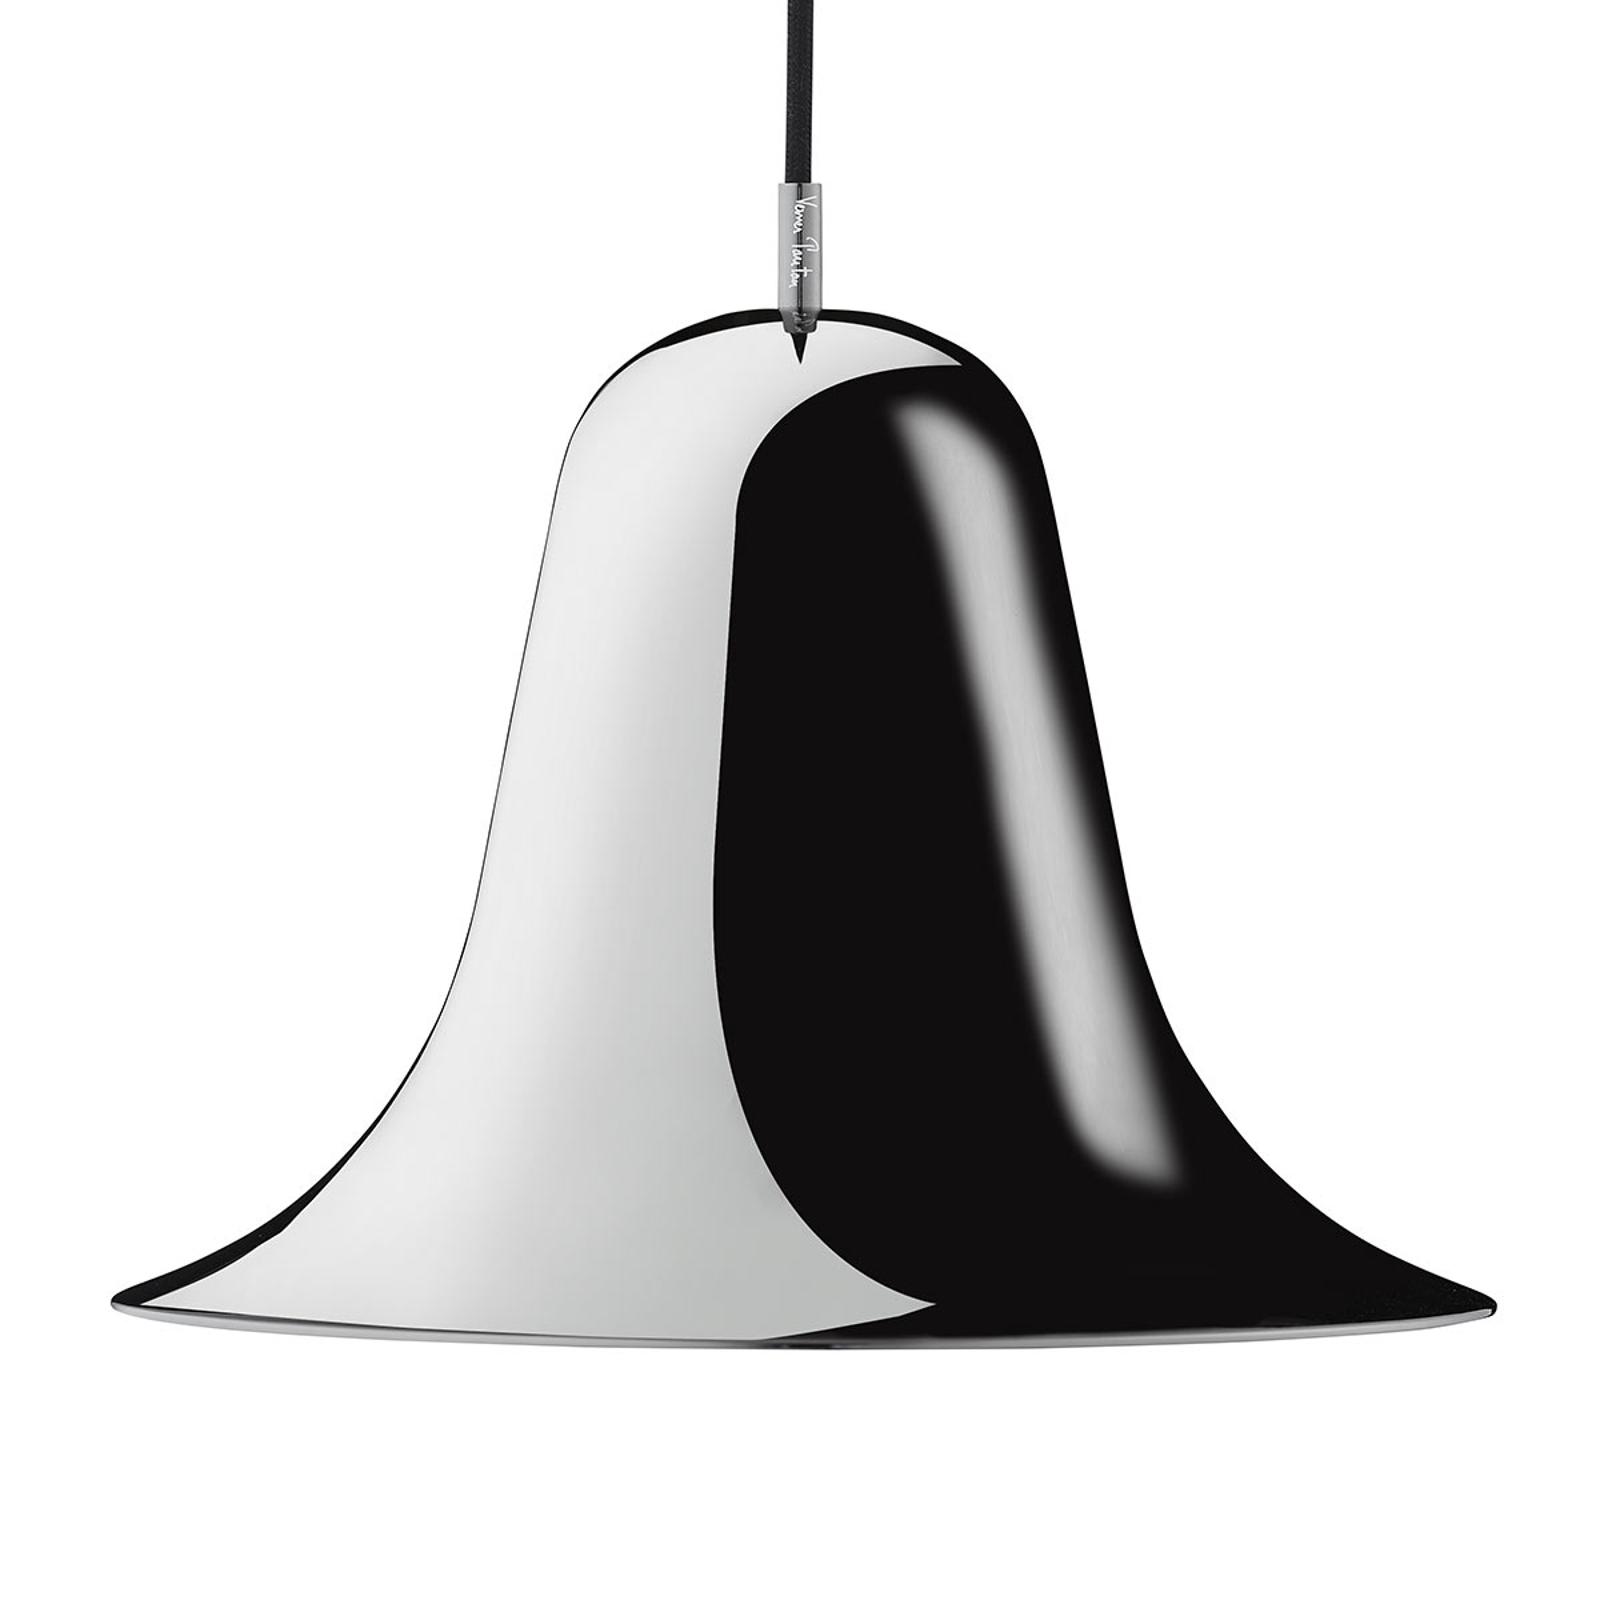 VERPAN Pantop sospensione, Ø 30cm, nero lucido